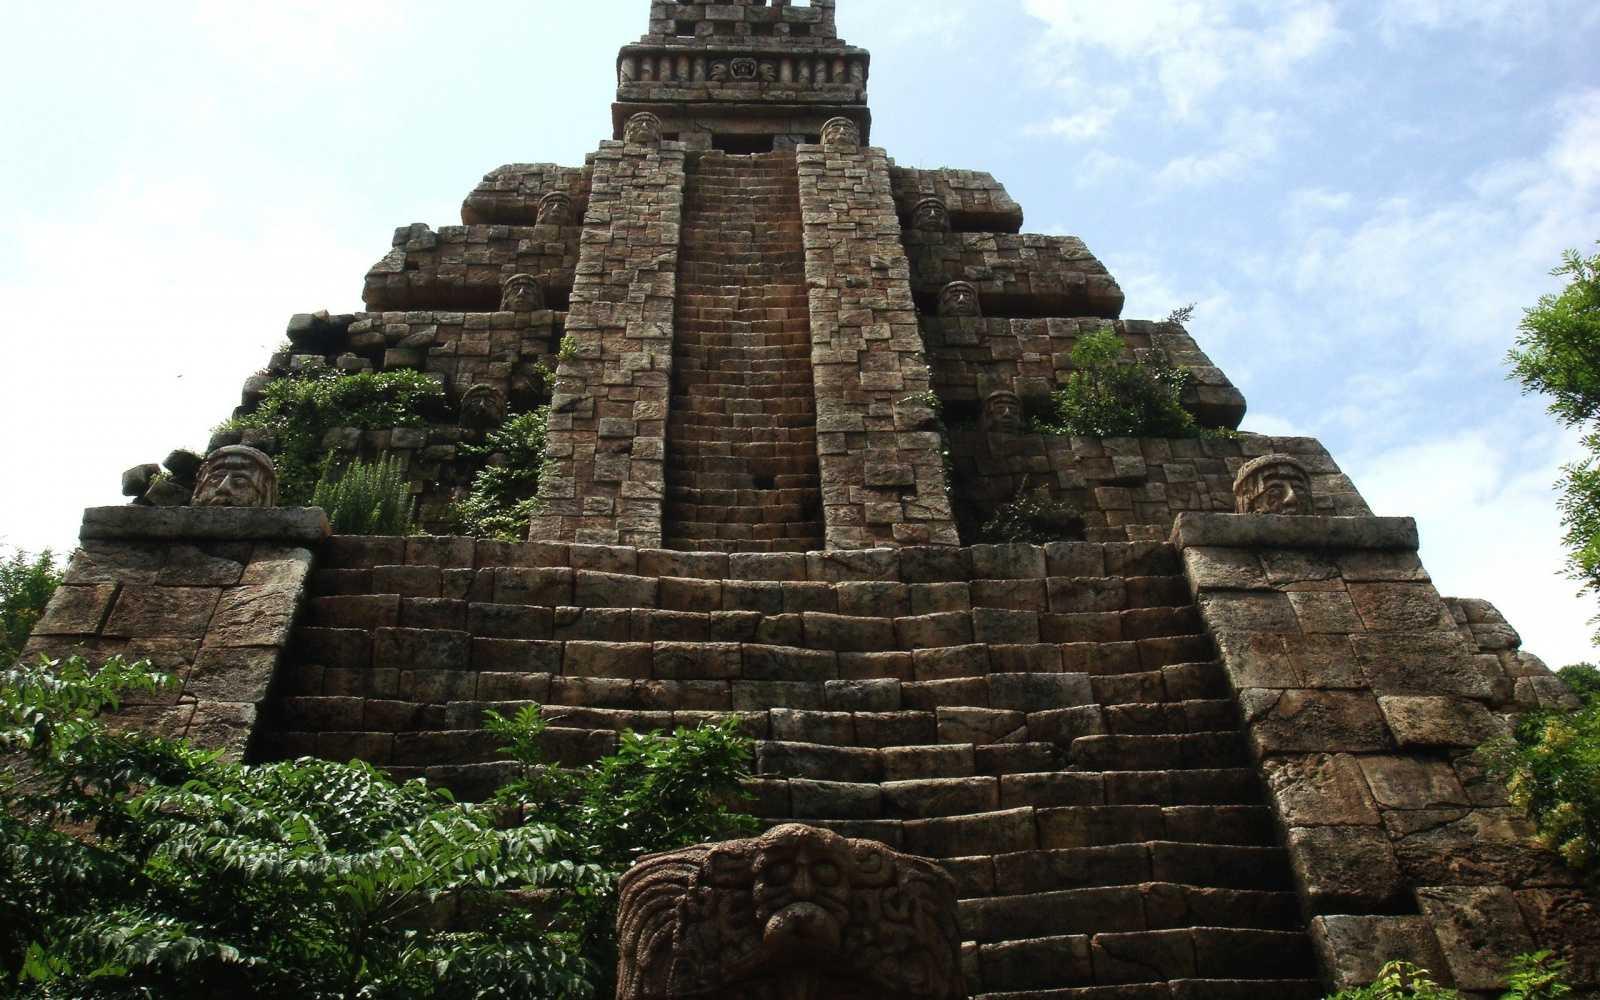 Aztec civivization